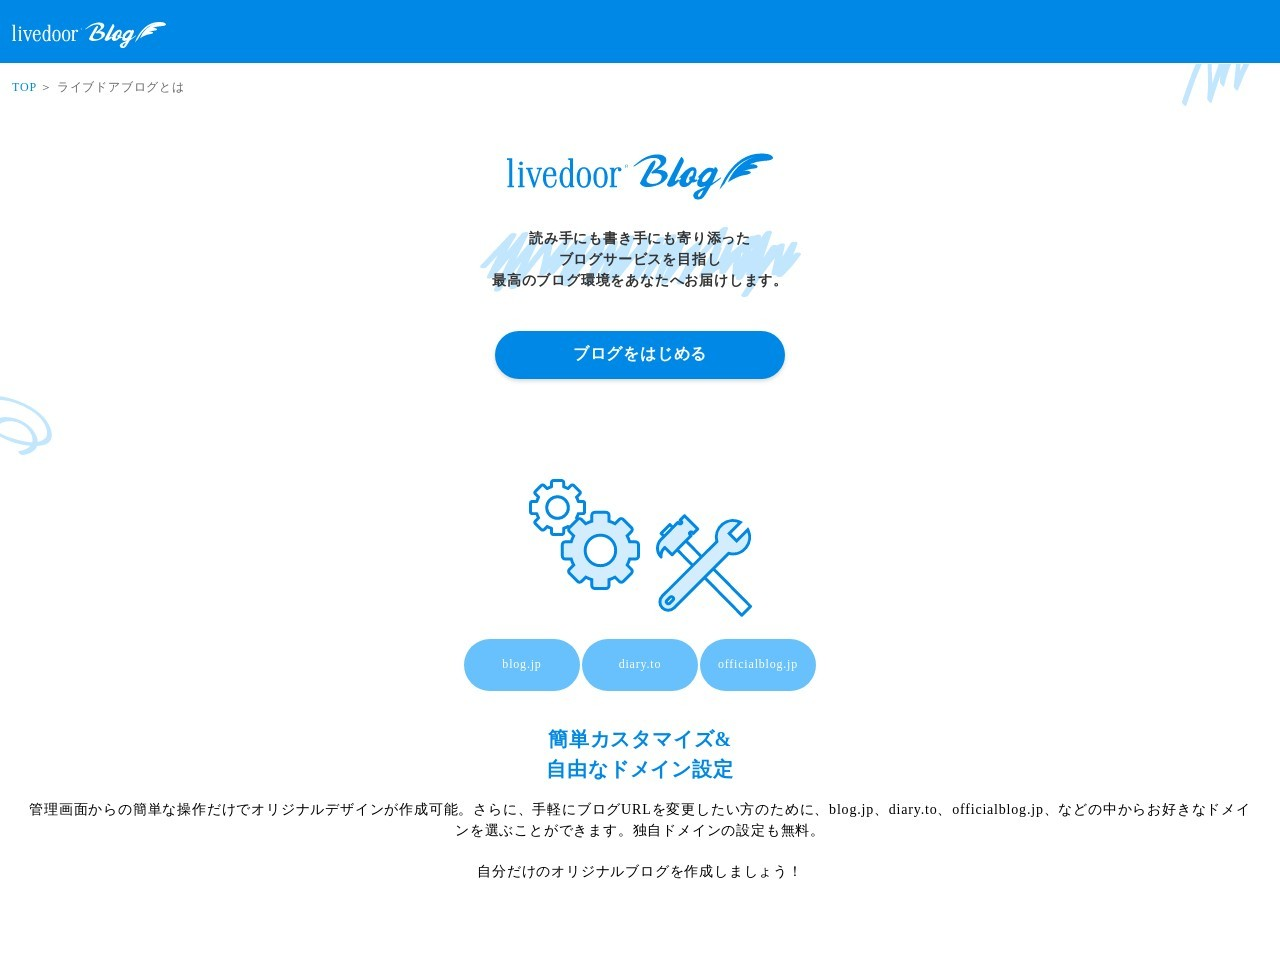 http://blog.livedoor.jp/dqnplus/archives/1780057.html